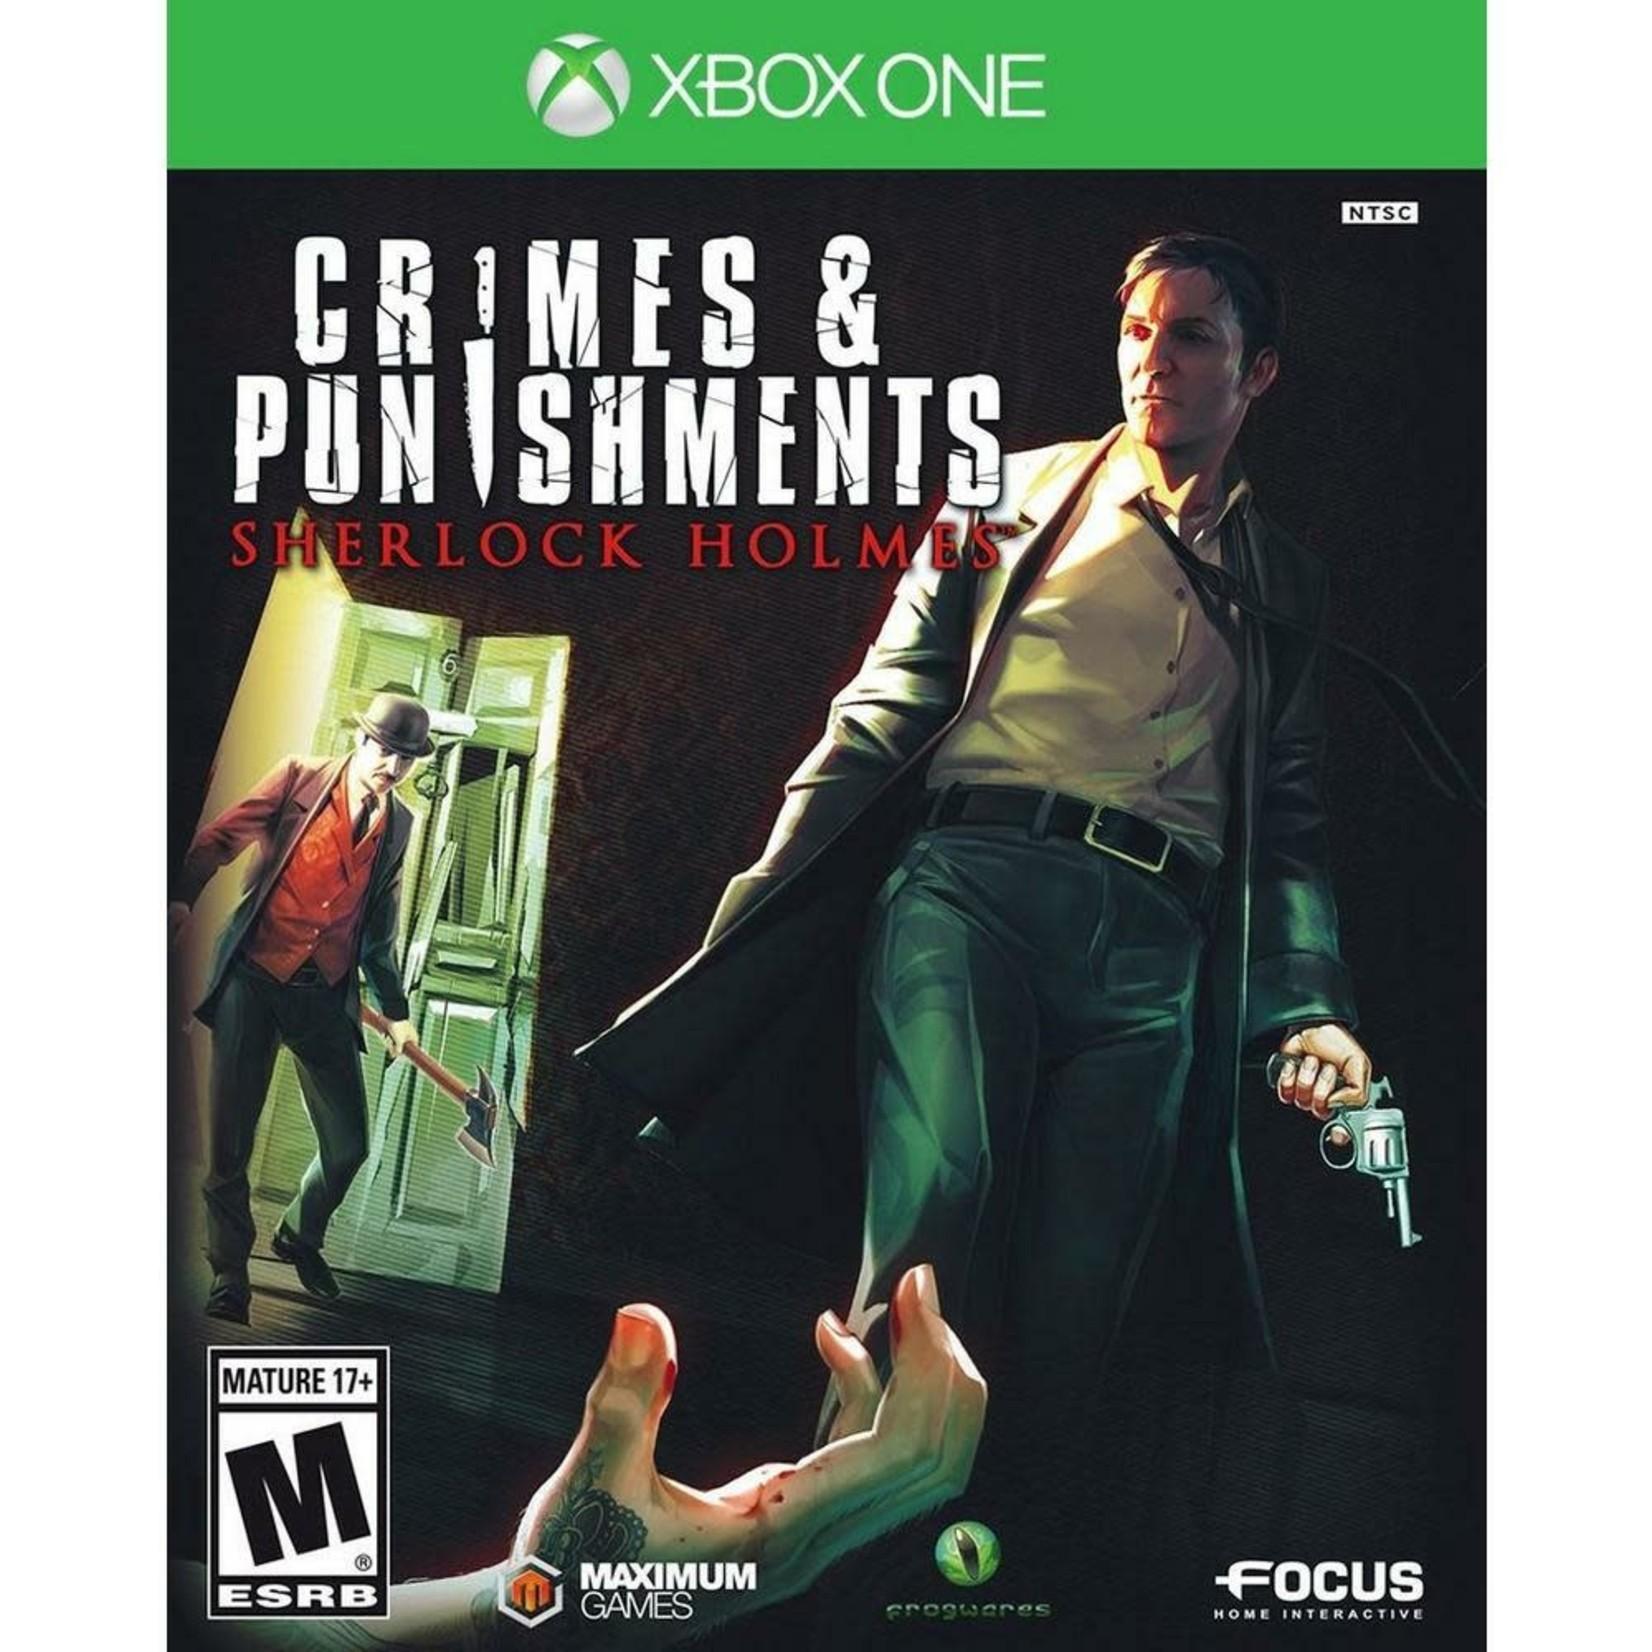 XB1U-Crimes and Punishments: Sherlock Holmes